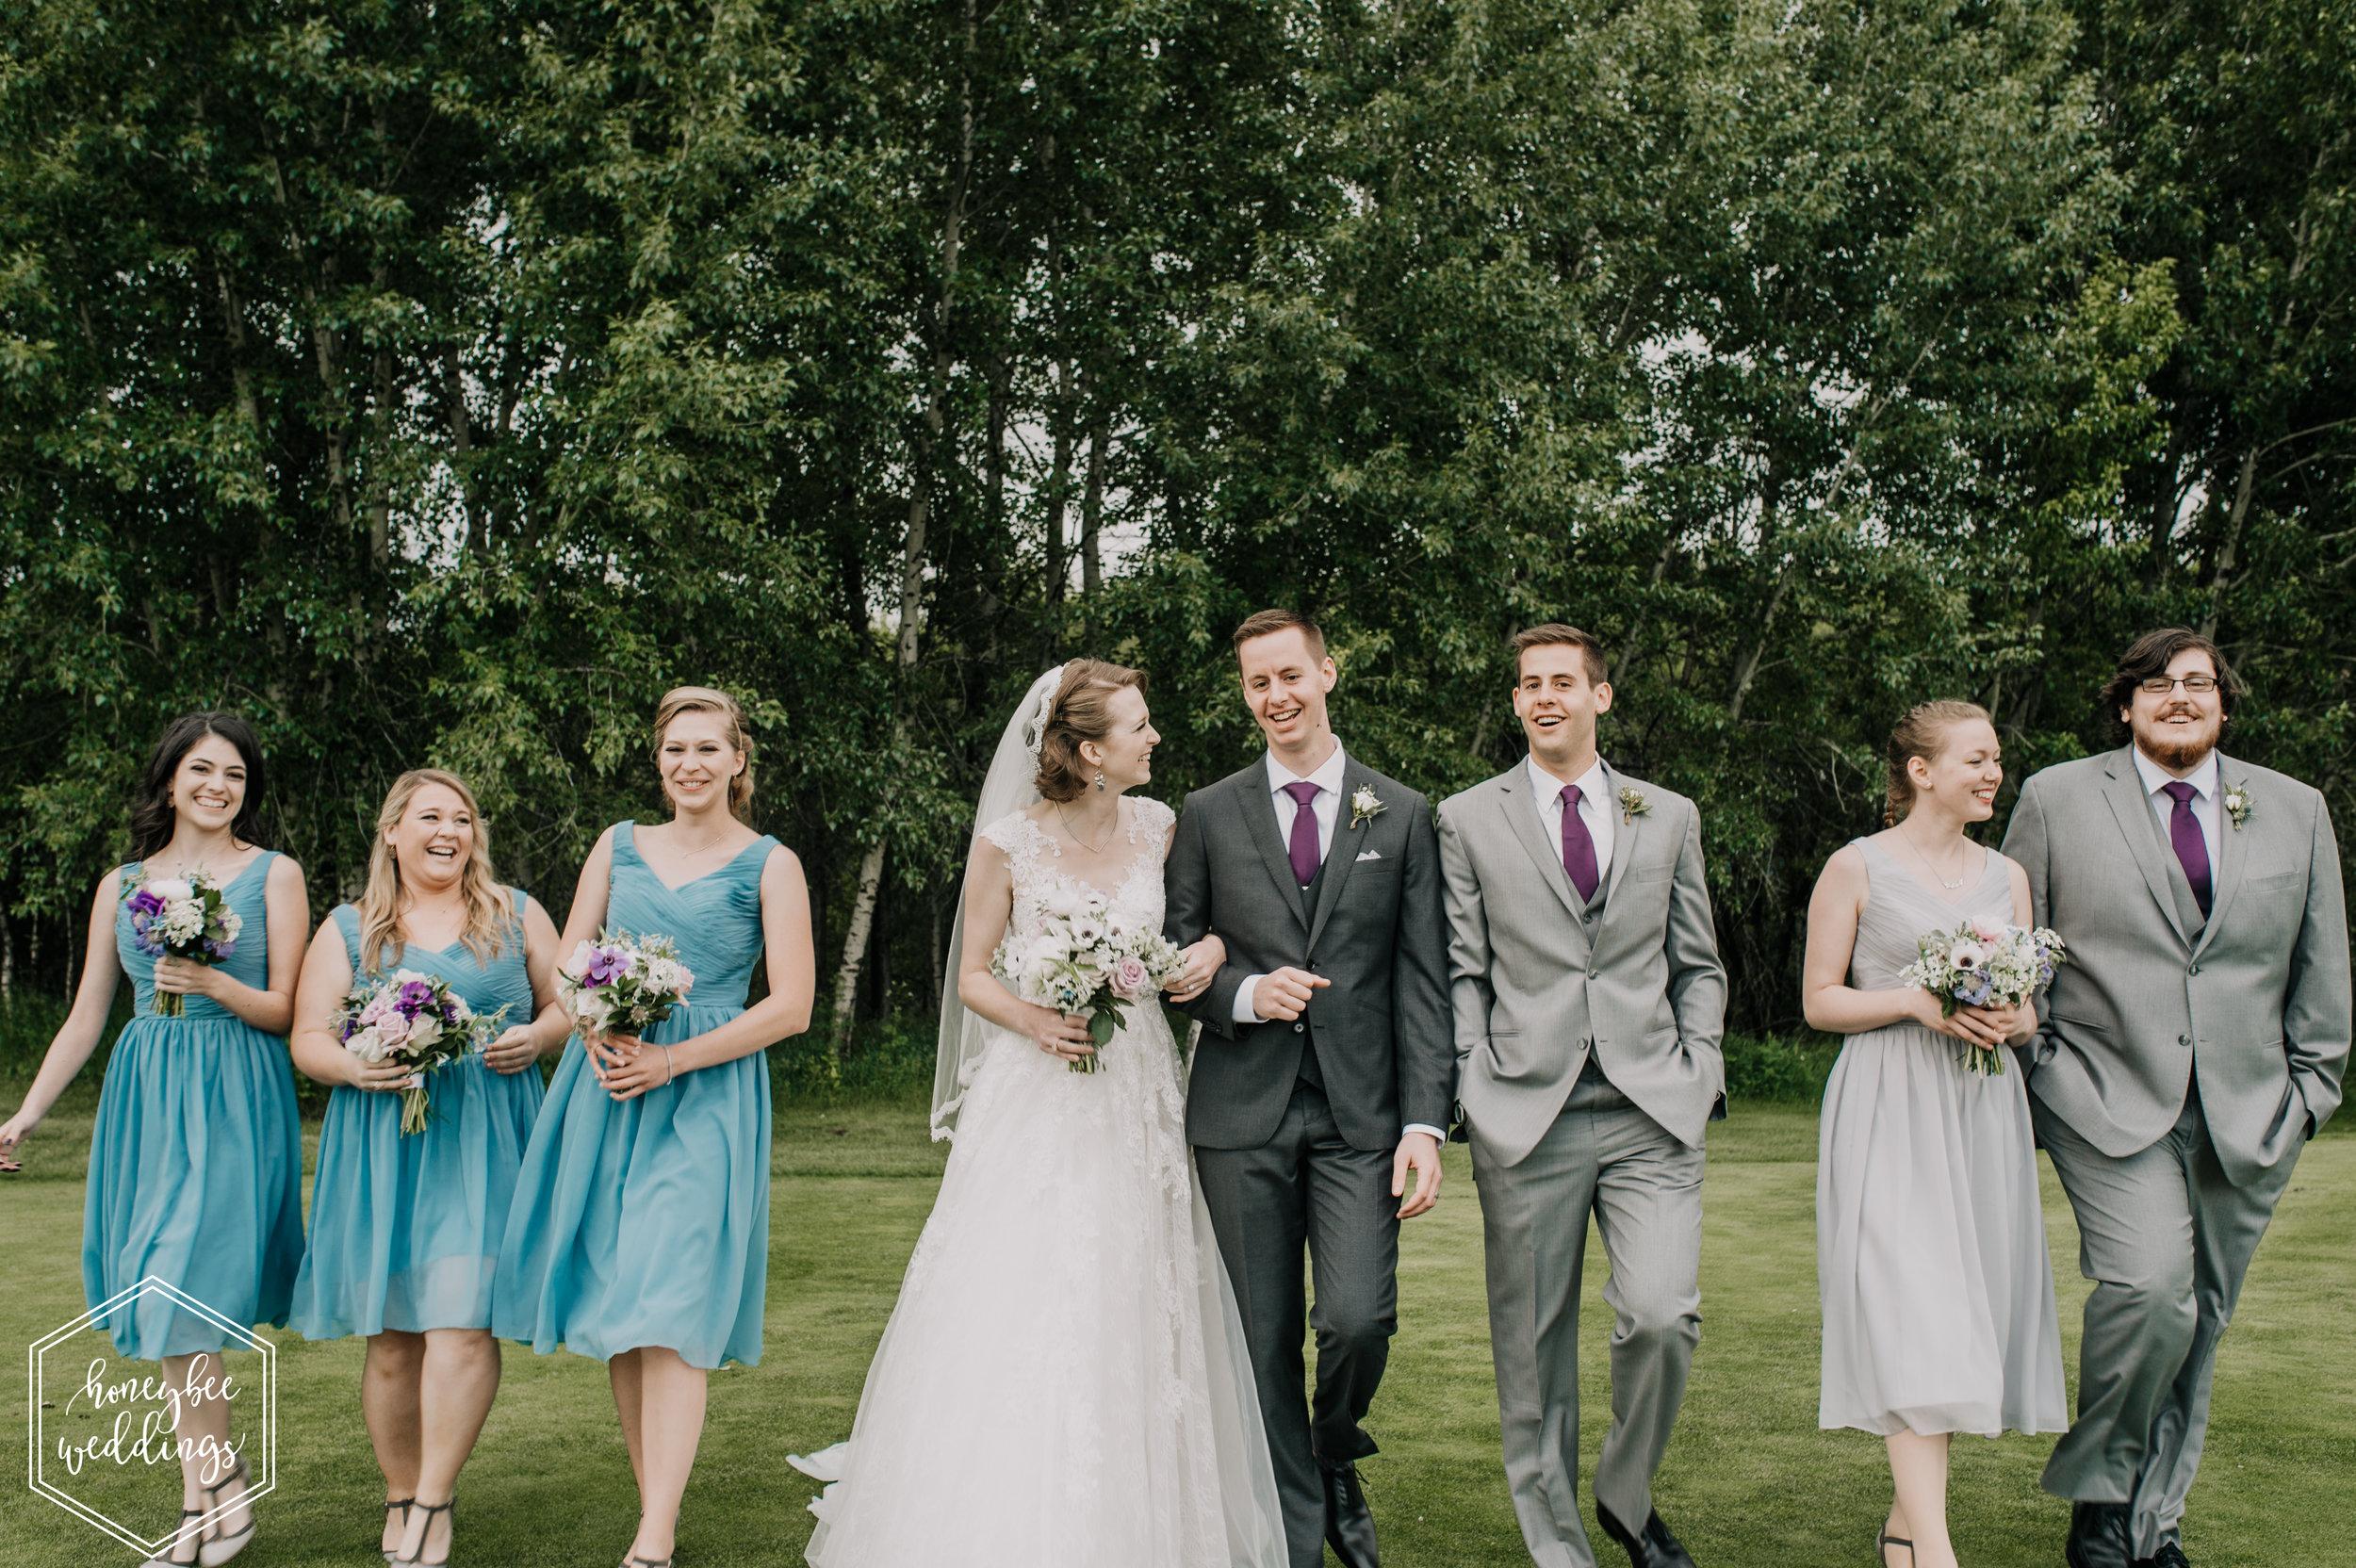 736 Riverside Country Club Wedding_Montana Wedding Photographer_Lauren Jackson + Evan Ivaldi 2018-8232.jpg